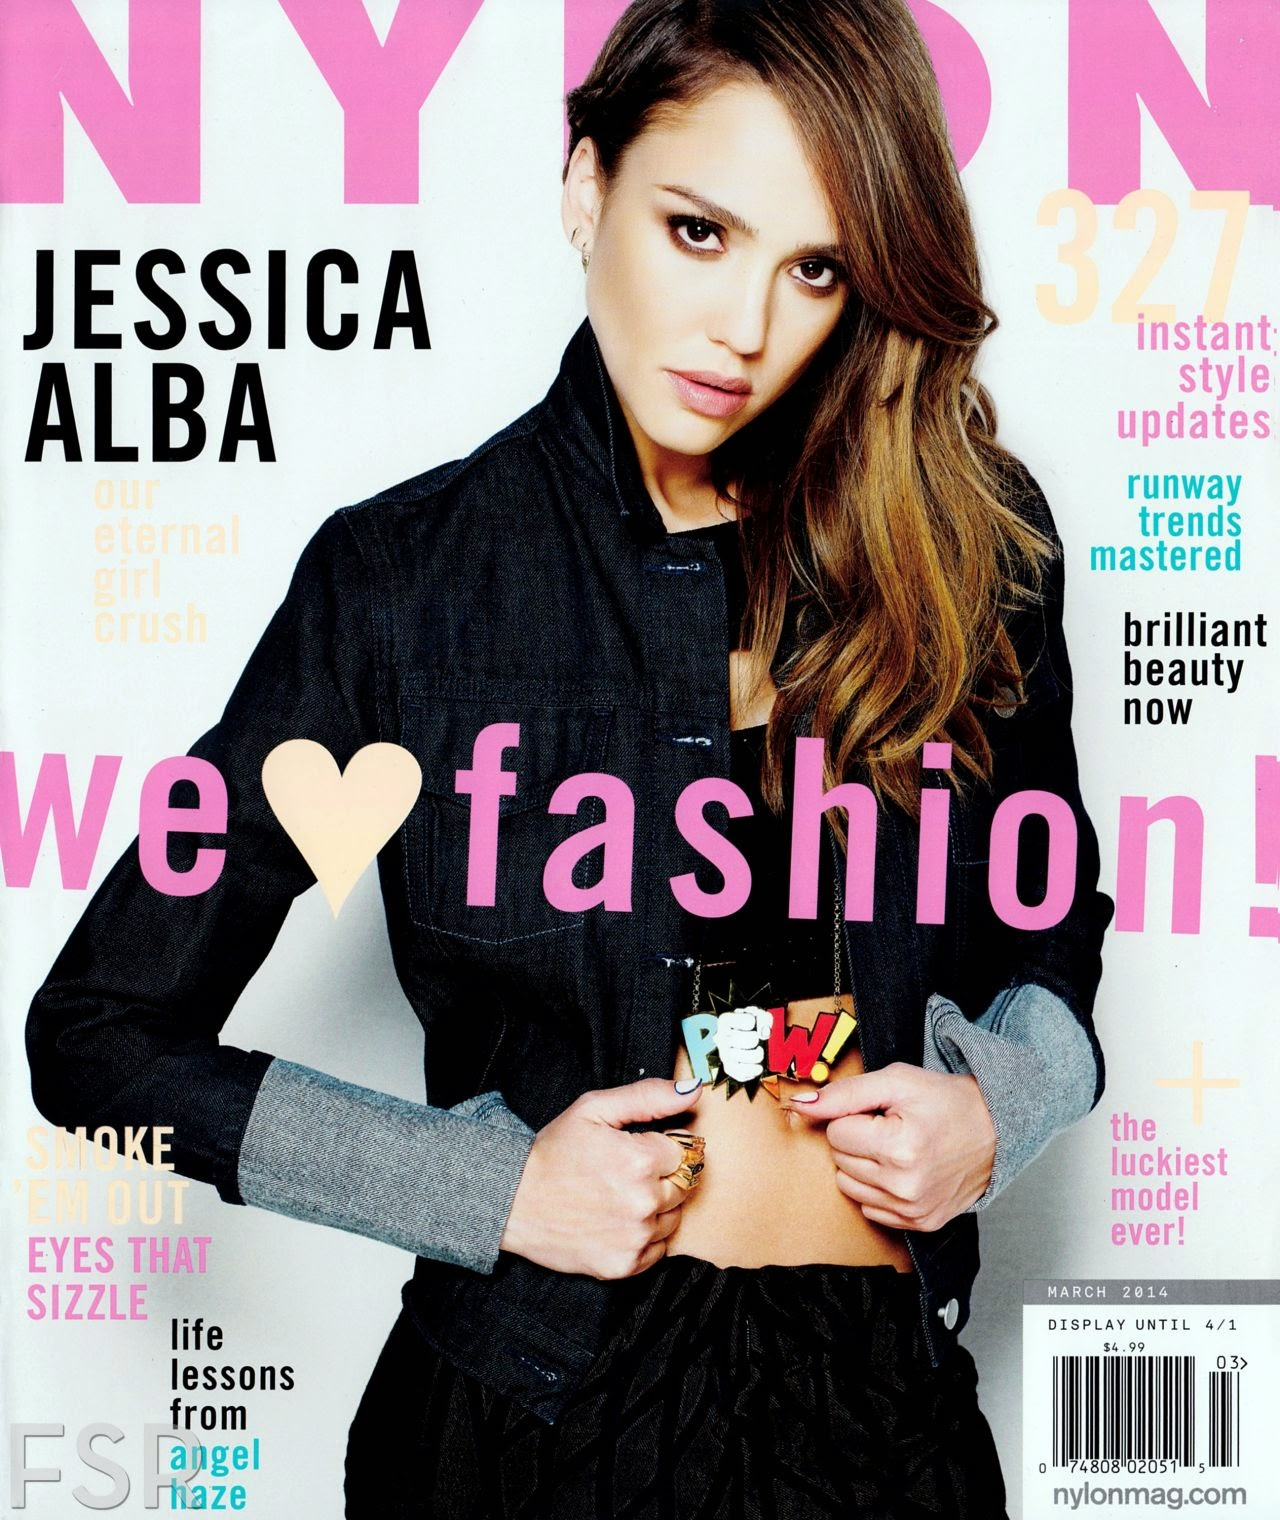 nylon_jessica_alba_cover.jpg